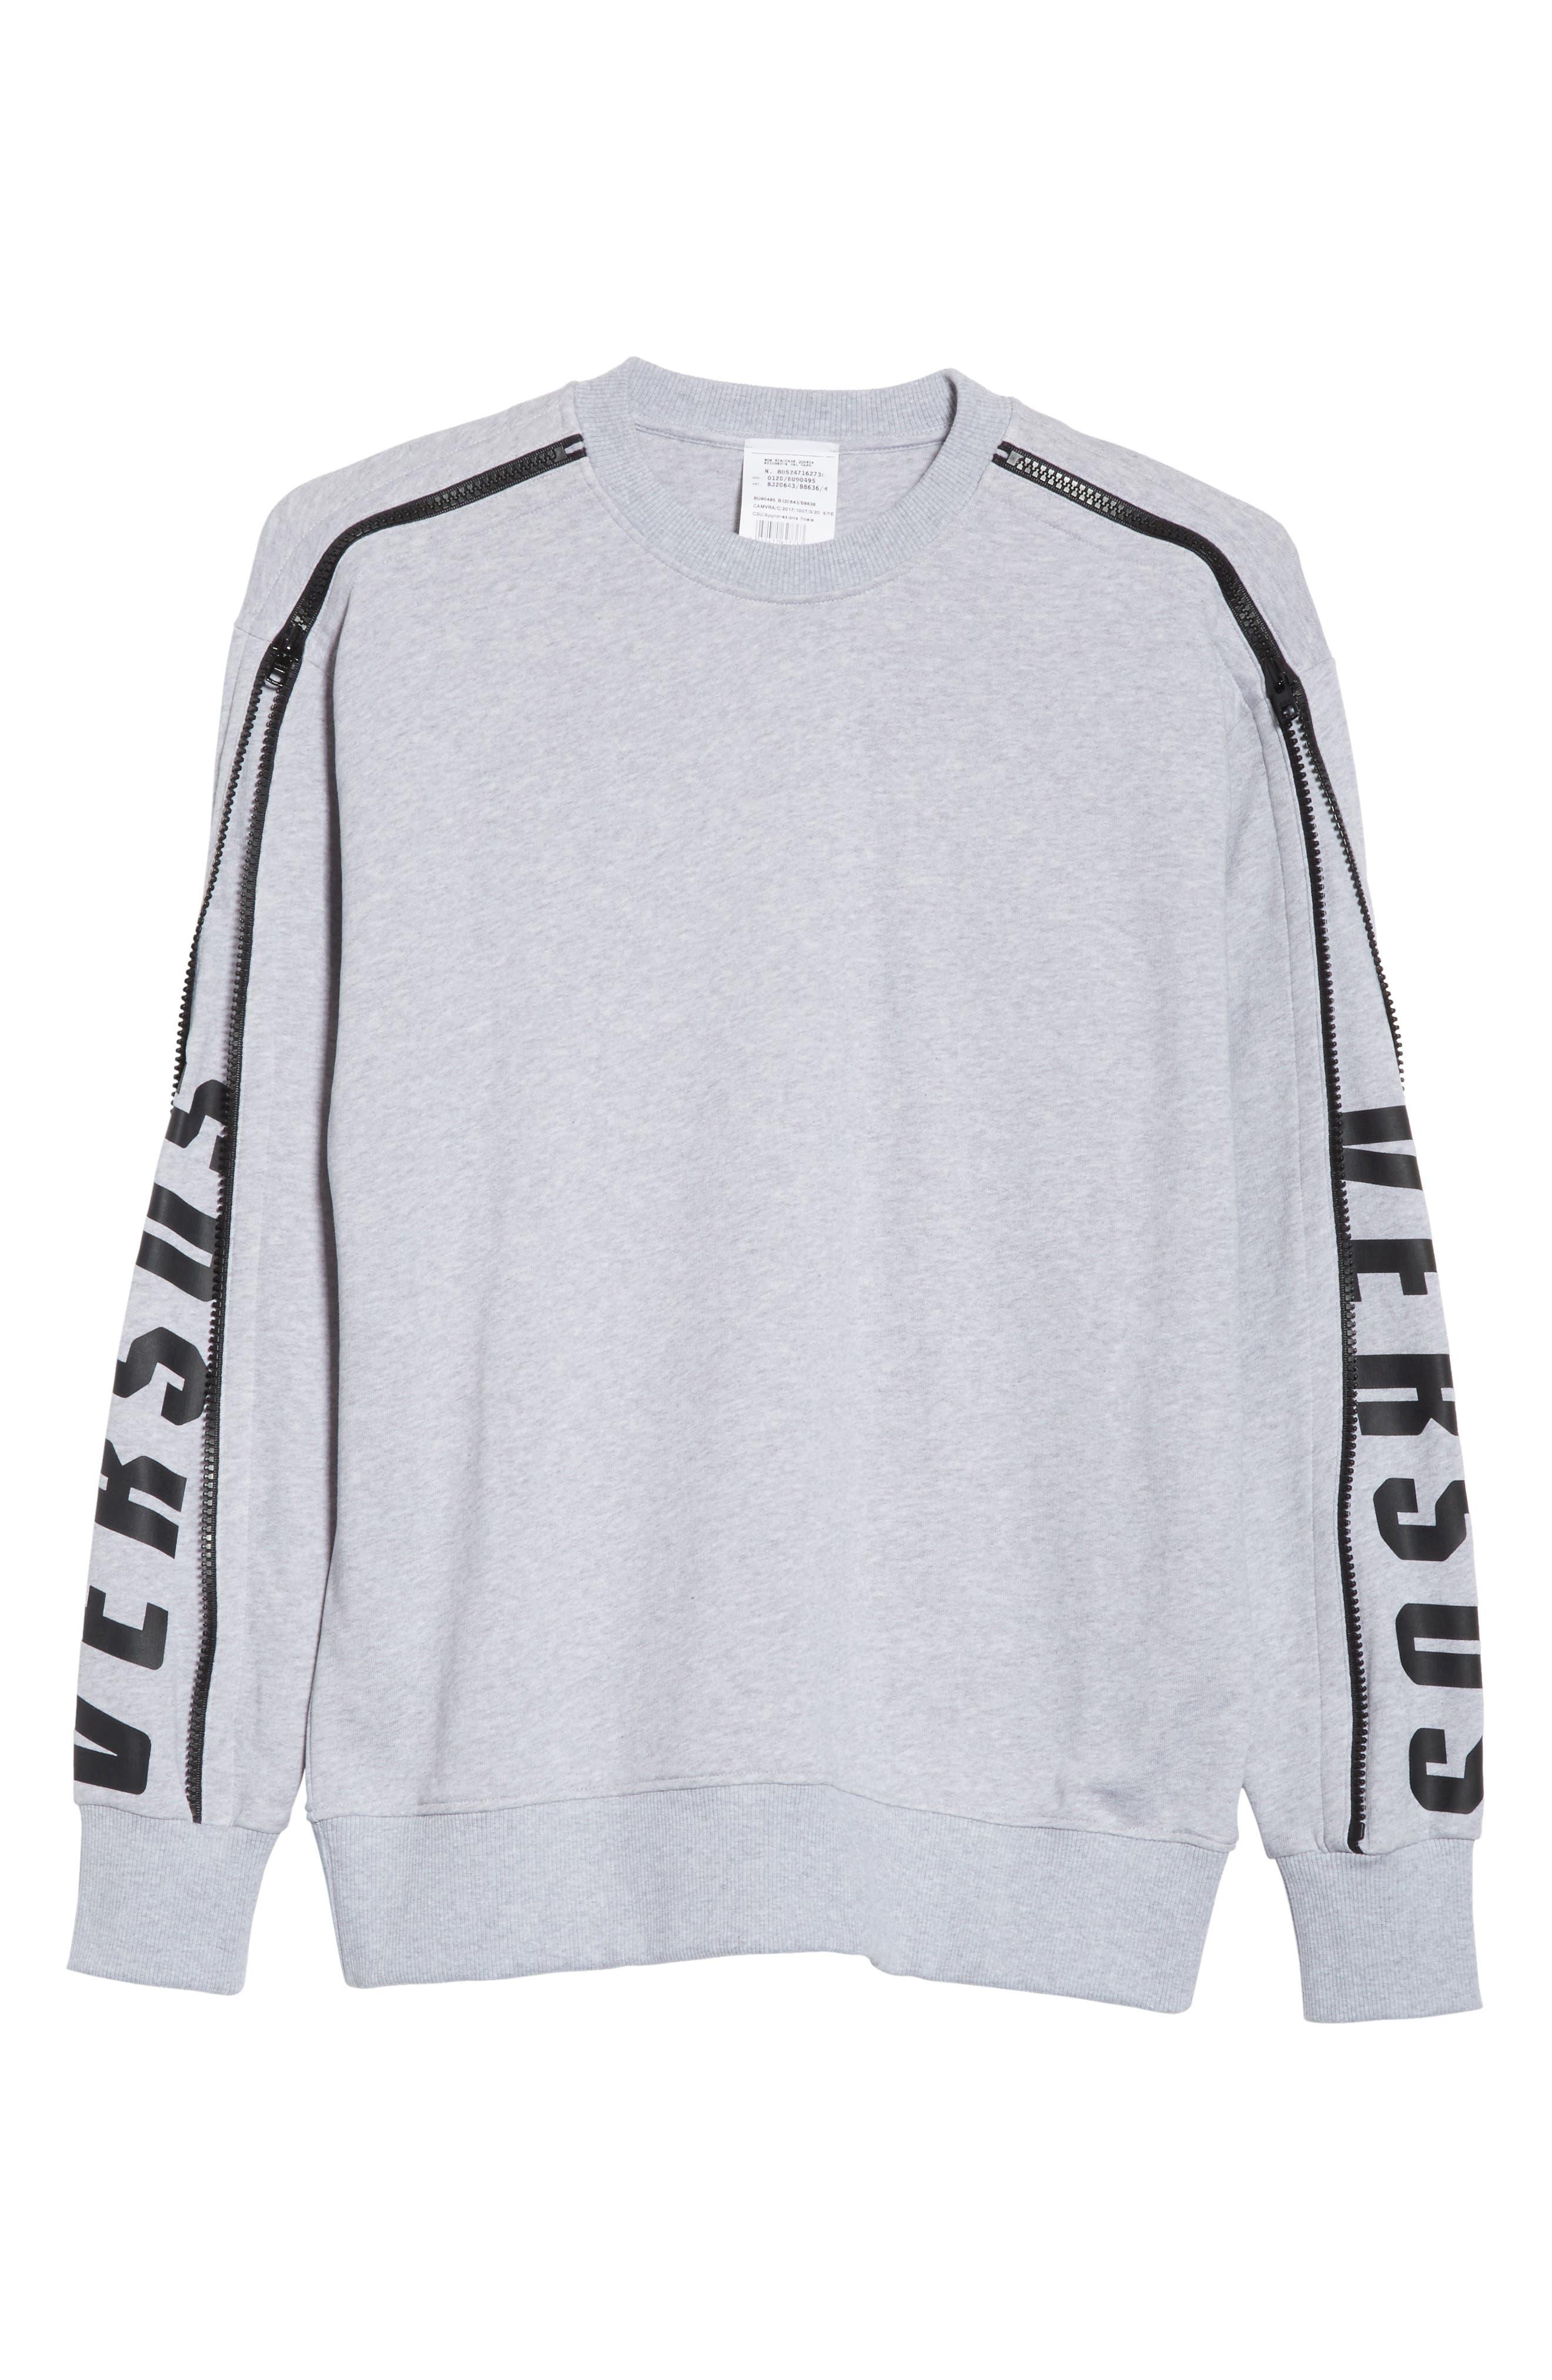 Zip Sleeve Crewneck Sweatshirt,                             Alternate thumbnail 6, color,                             GREY